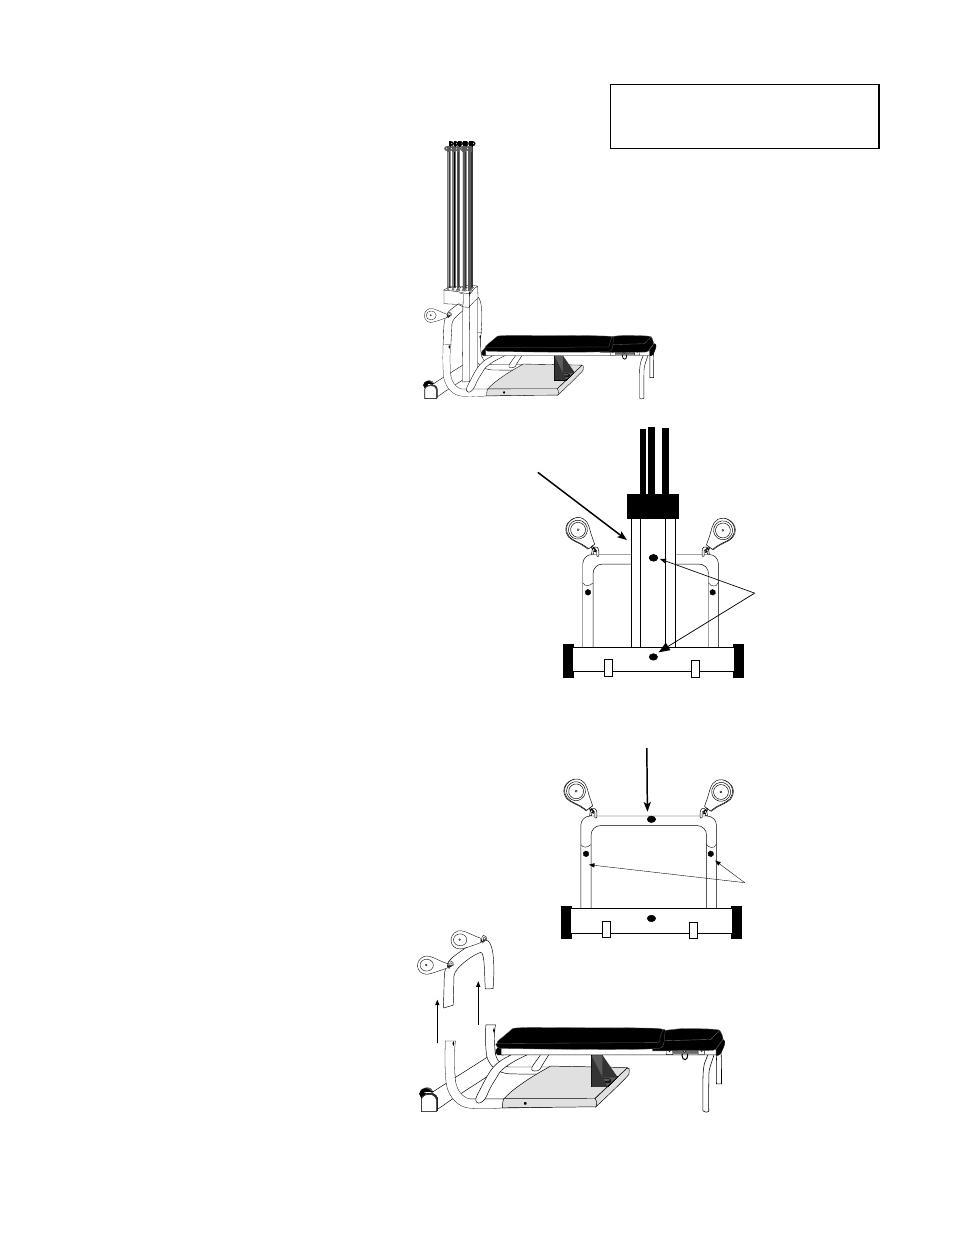 chest bar assembly instructions step 2 step 1 step 4 bowflex xtl rh manualsdir com Bowflex Treadmill Series 7 Bowflex XTL Manual PDF